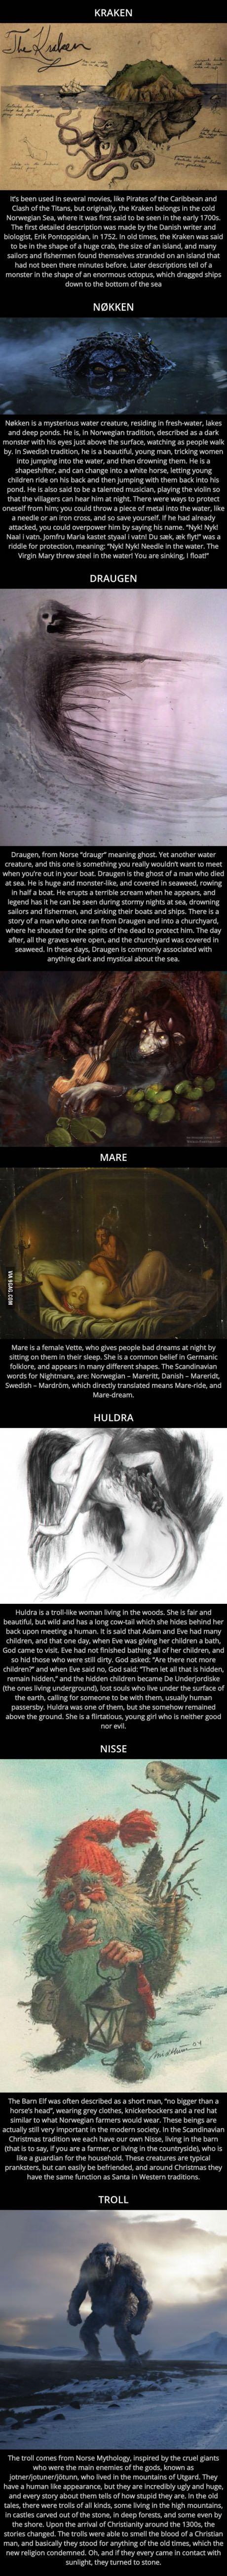 Nordic folklore: